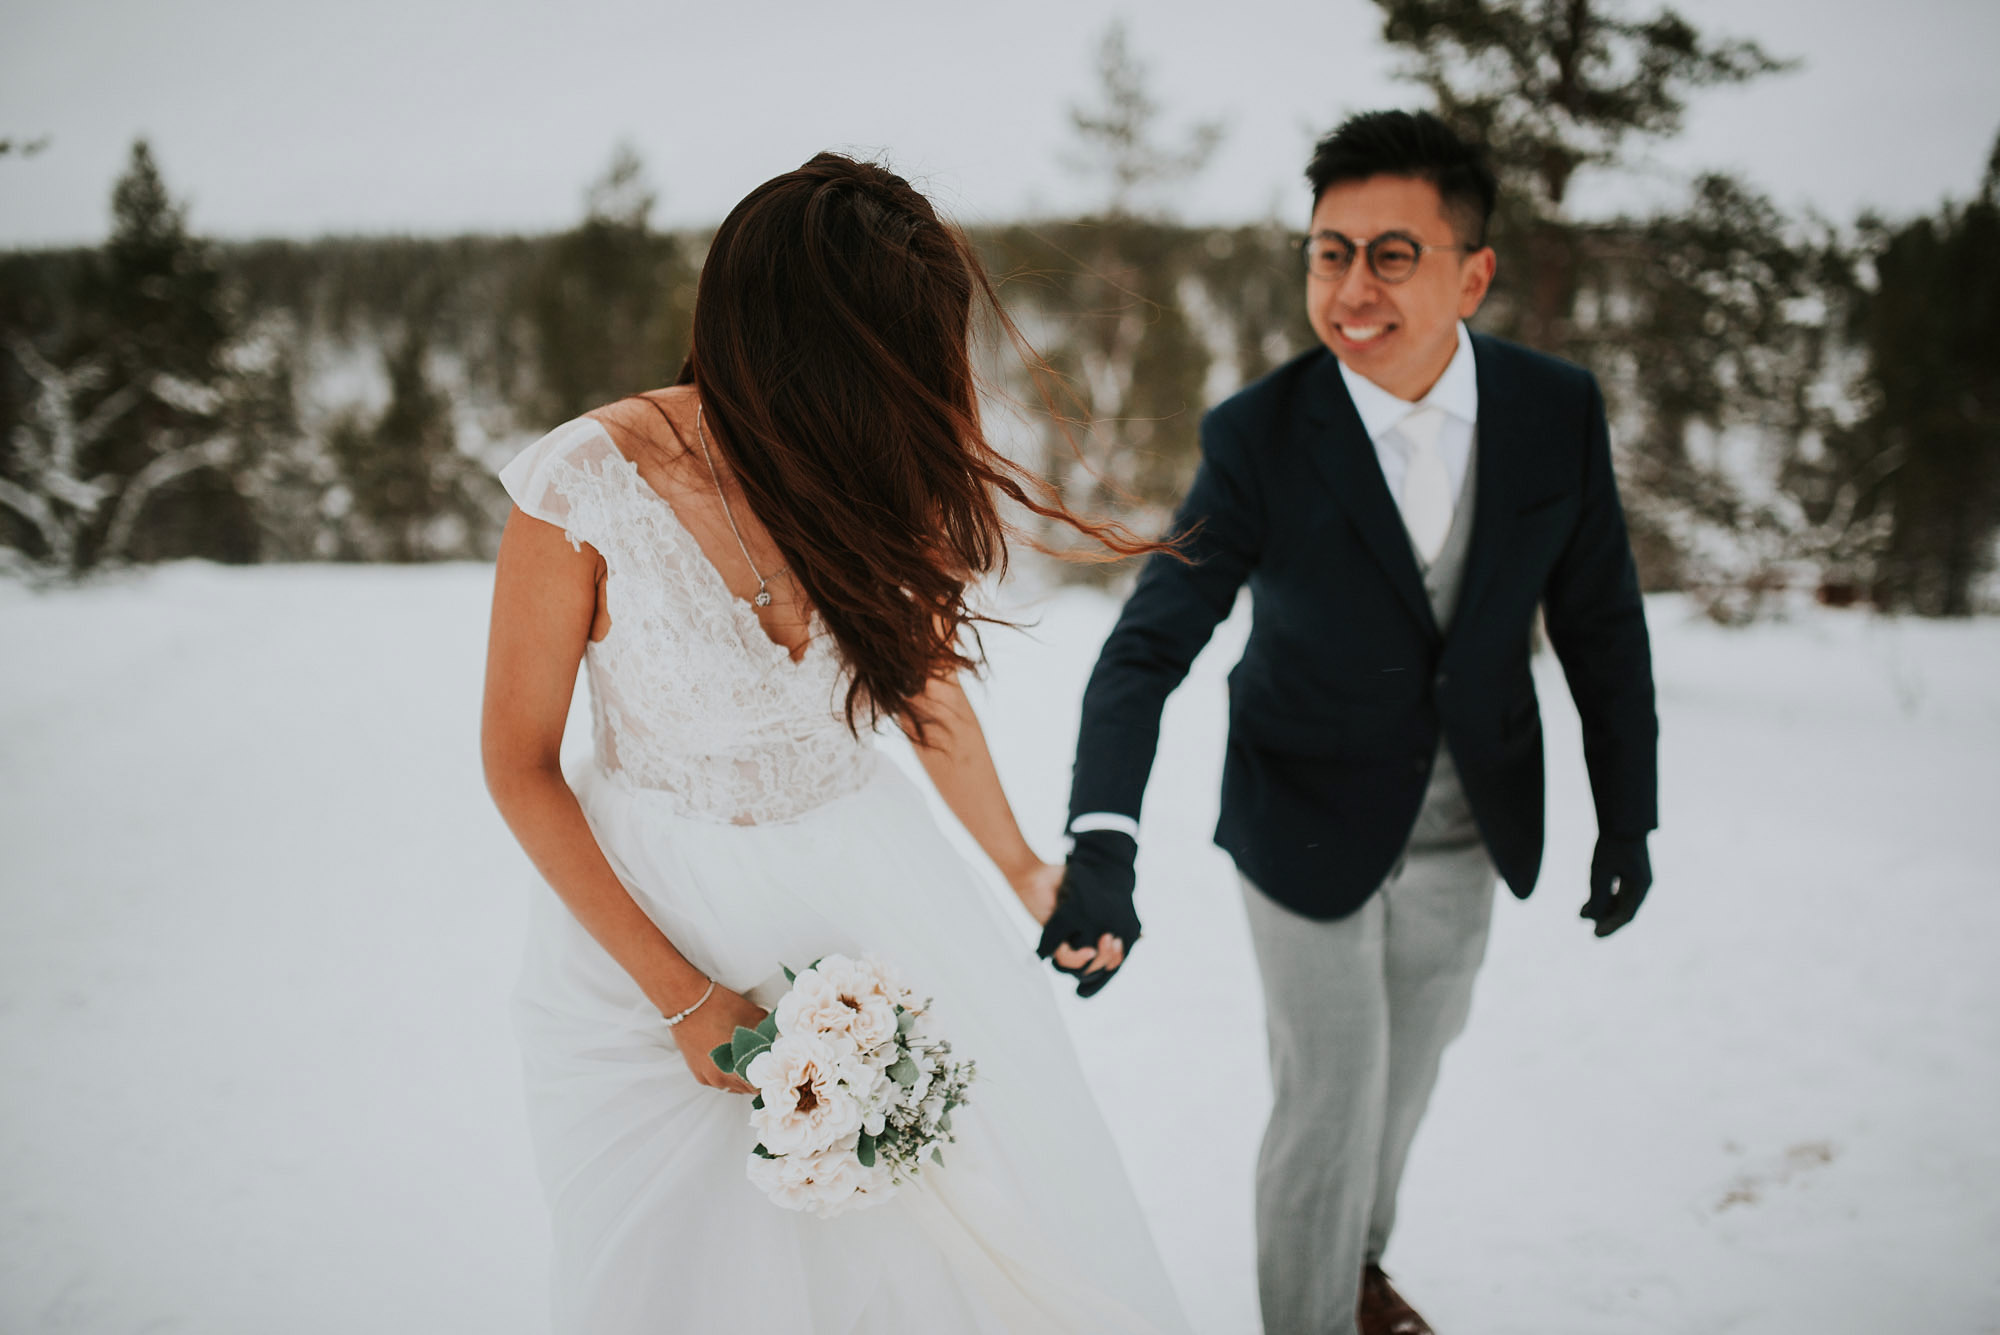 levi-ice-chapel-weddings-lapland-finland-photographer-jere-satamo-031-blog.jpg